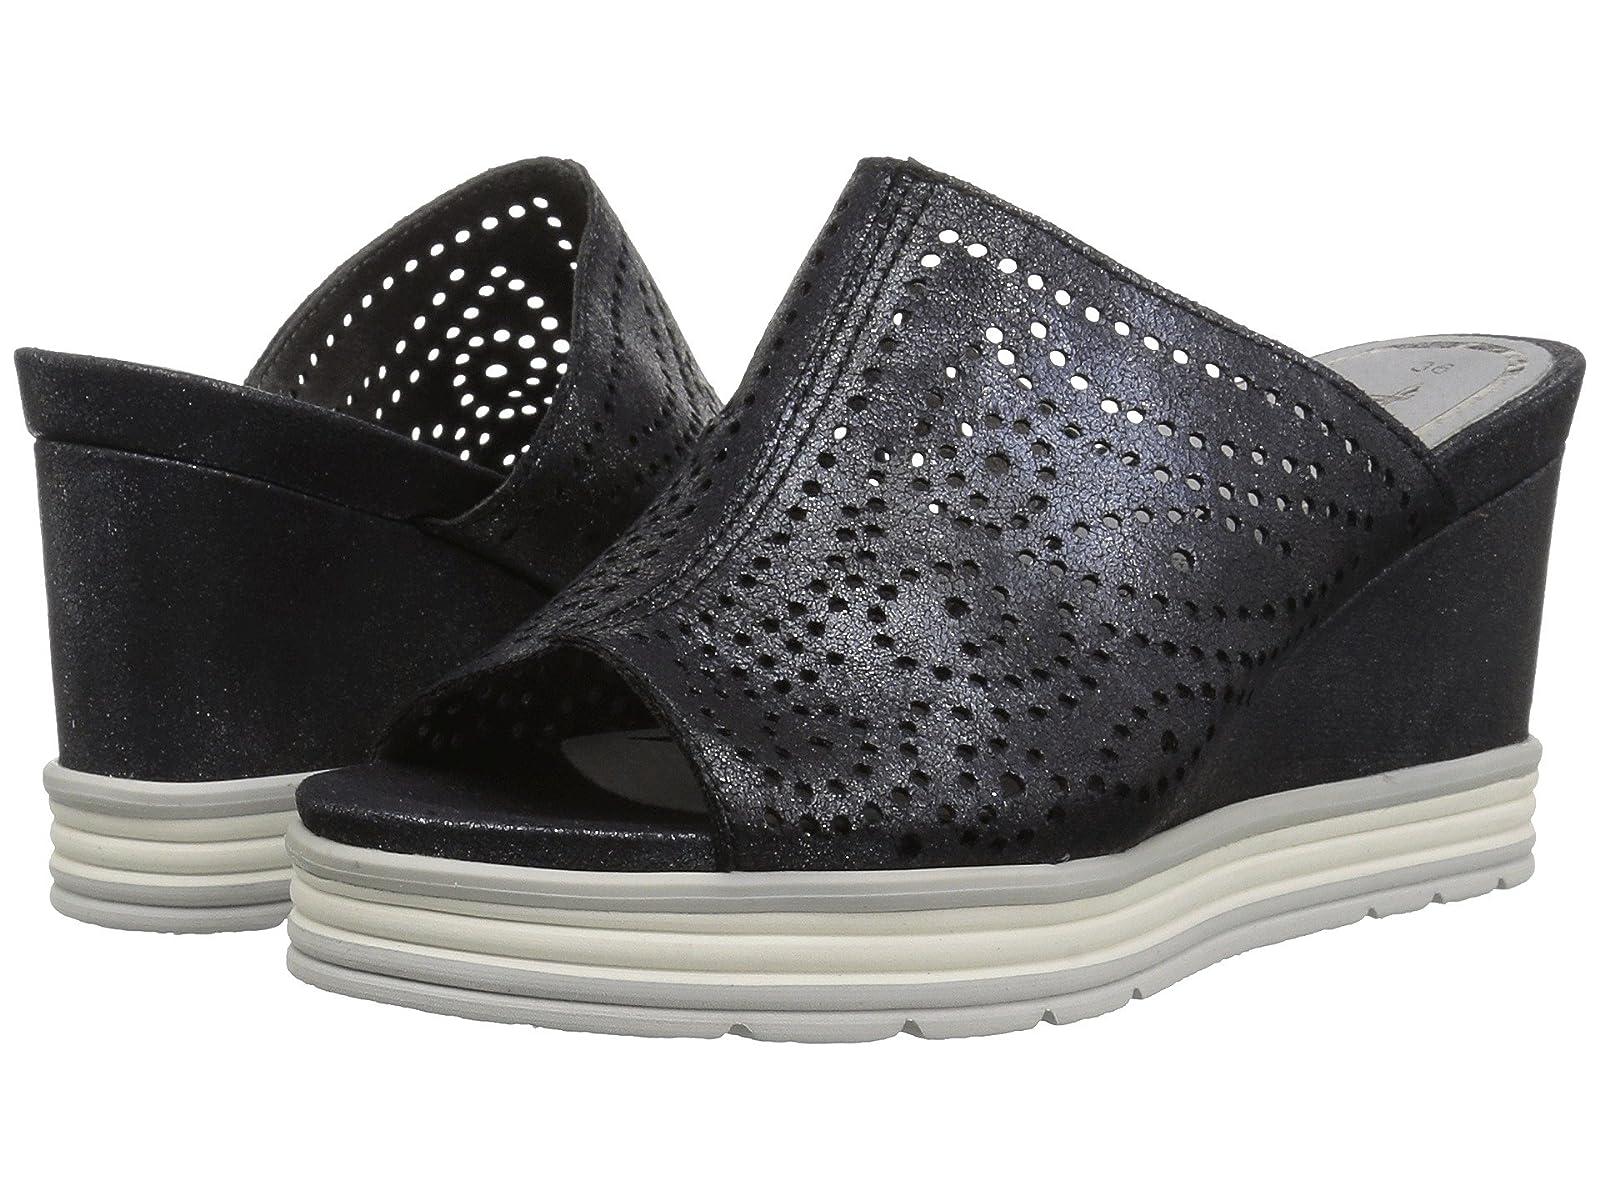 Tamaris Alis 1-1-27236-20Atmospheric grades have affordable shoes